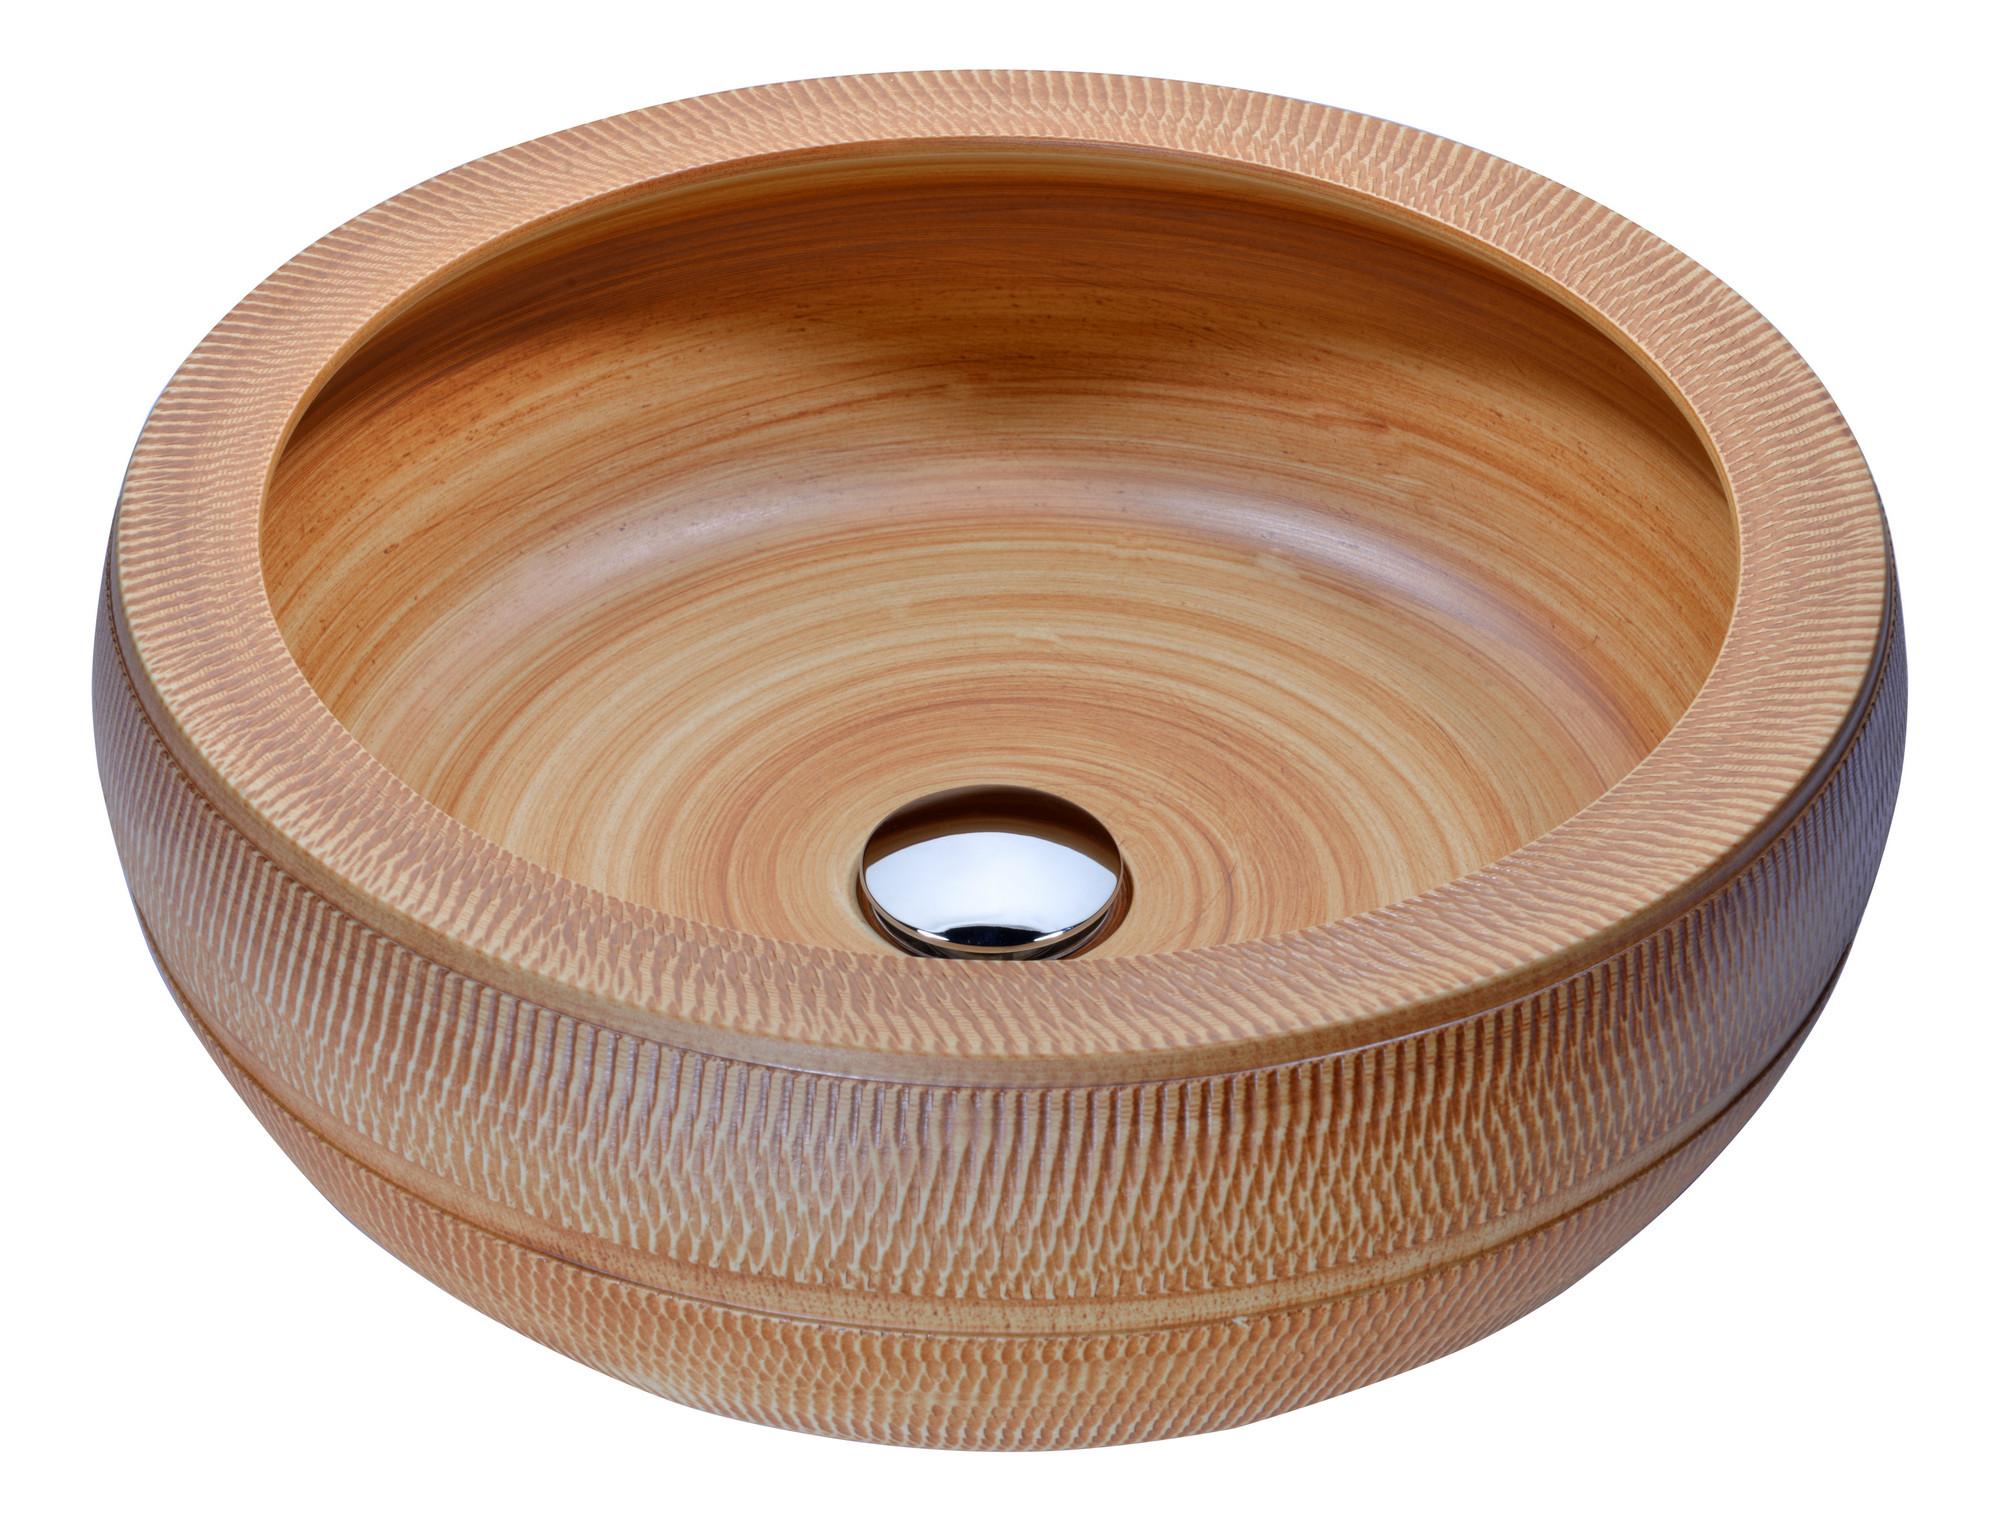 ANZZI LS-AZ189 Regalia Series Deco-Glass Vessel Sink In Styled Chestnut